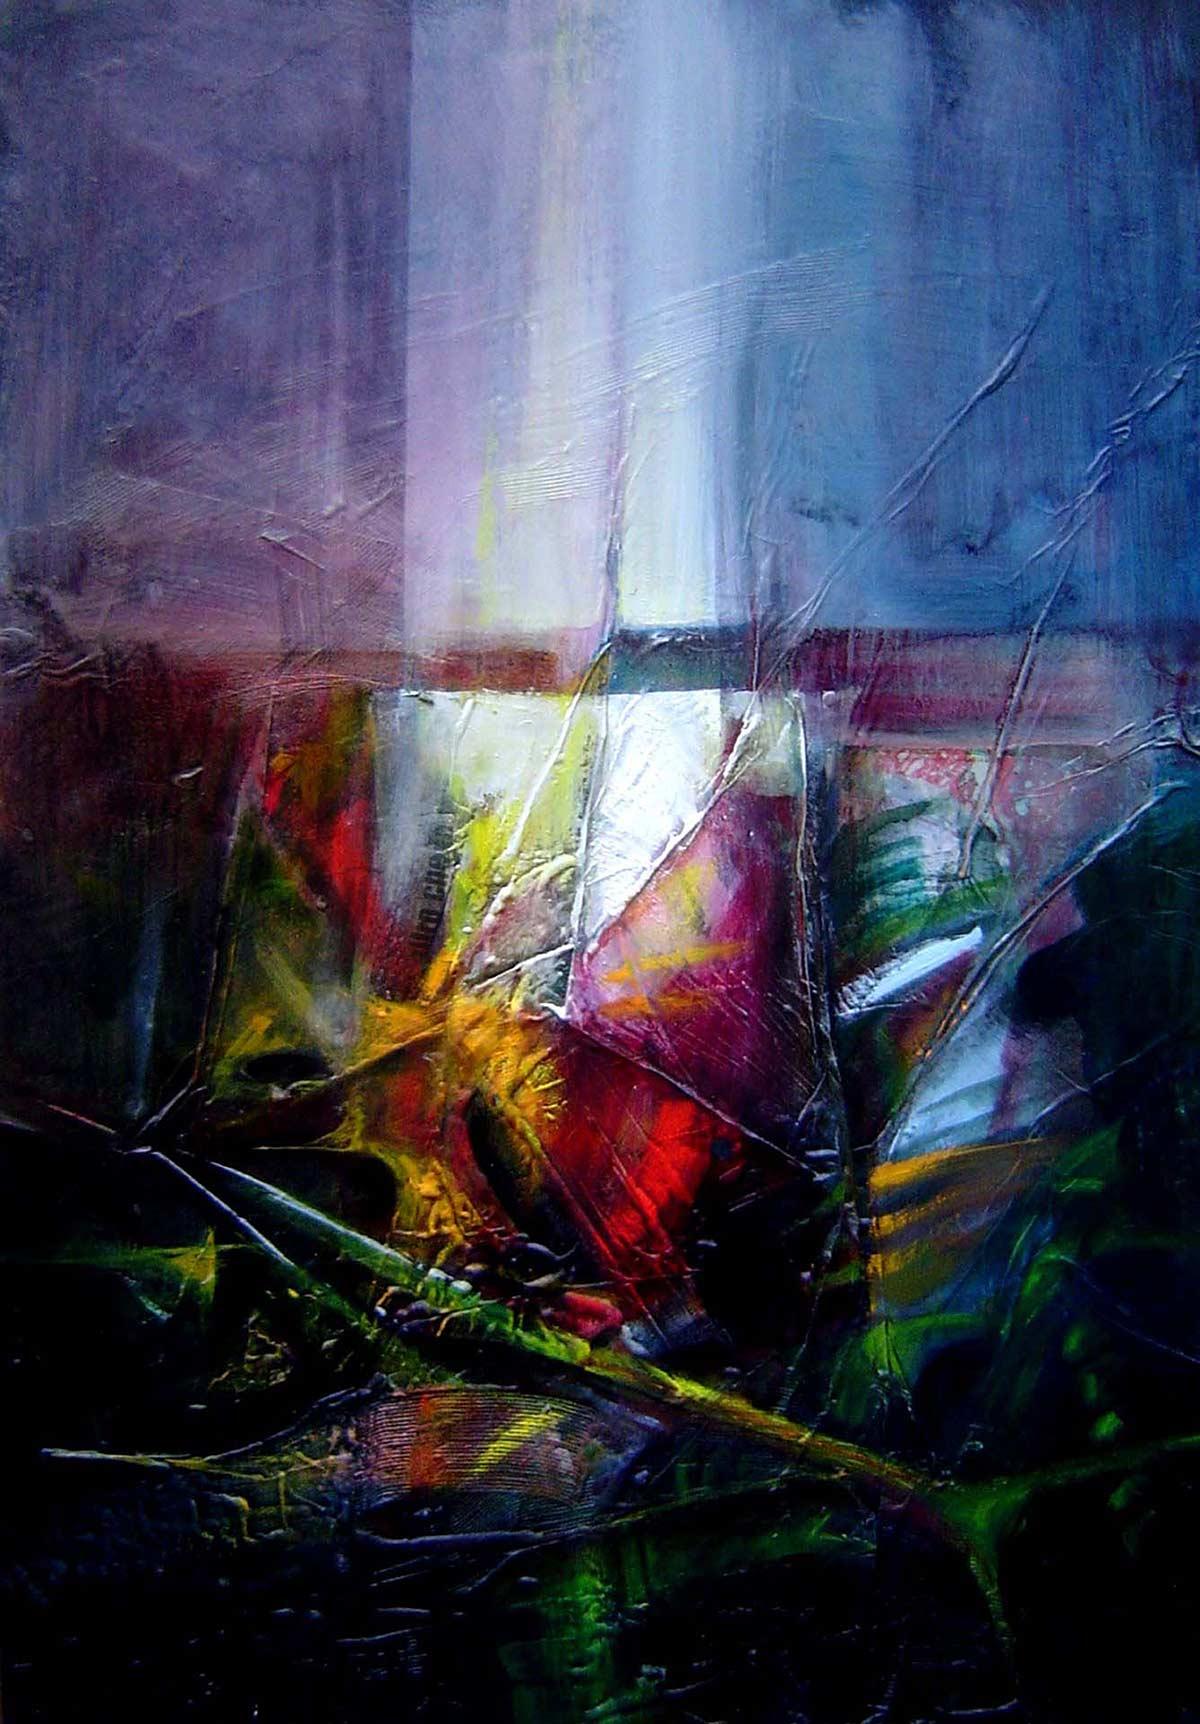 Illuminazione - Franco Margari - Pittura